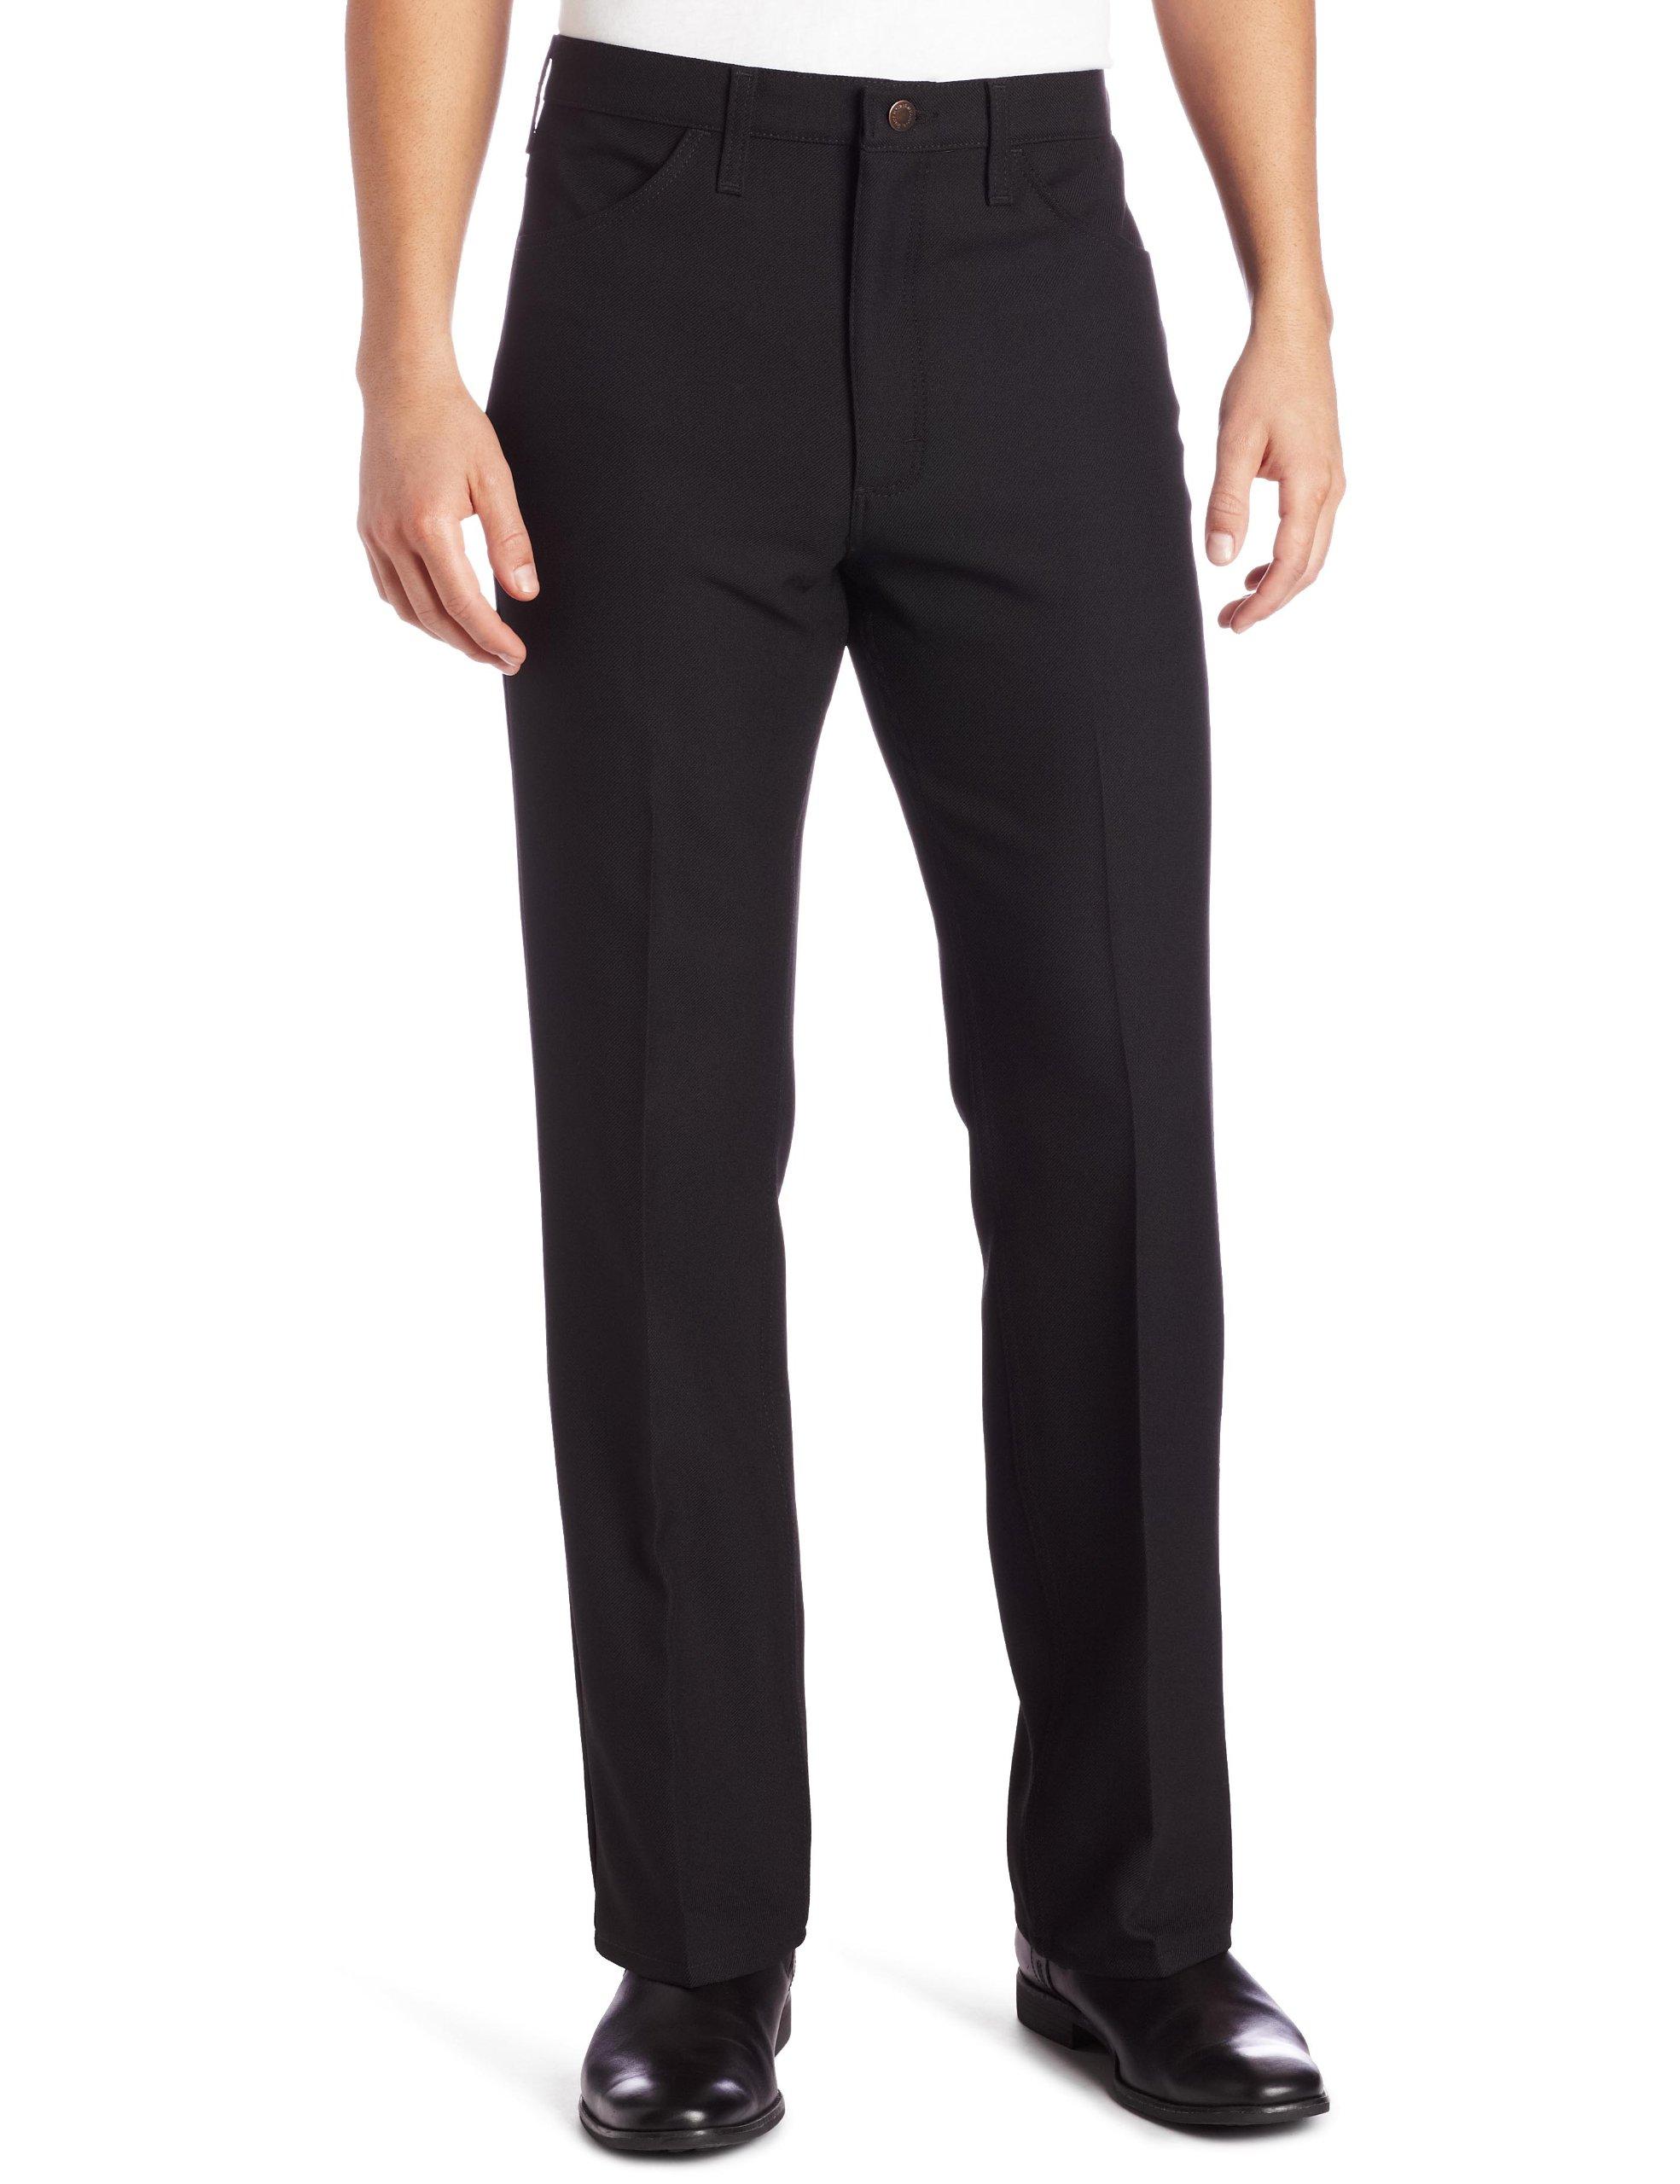 Wrangler Men's Big Wrancher Dress Pant Black, Black, 46x30